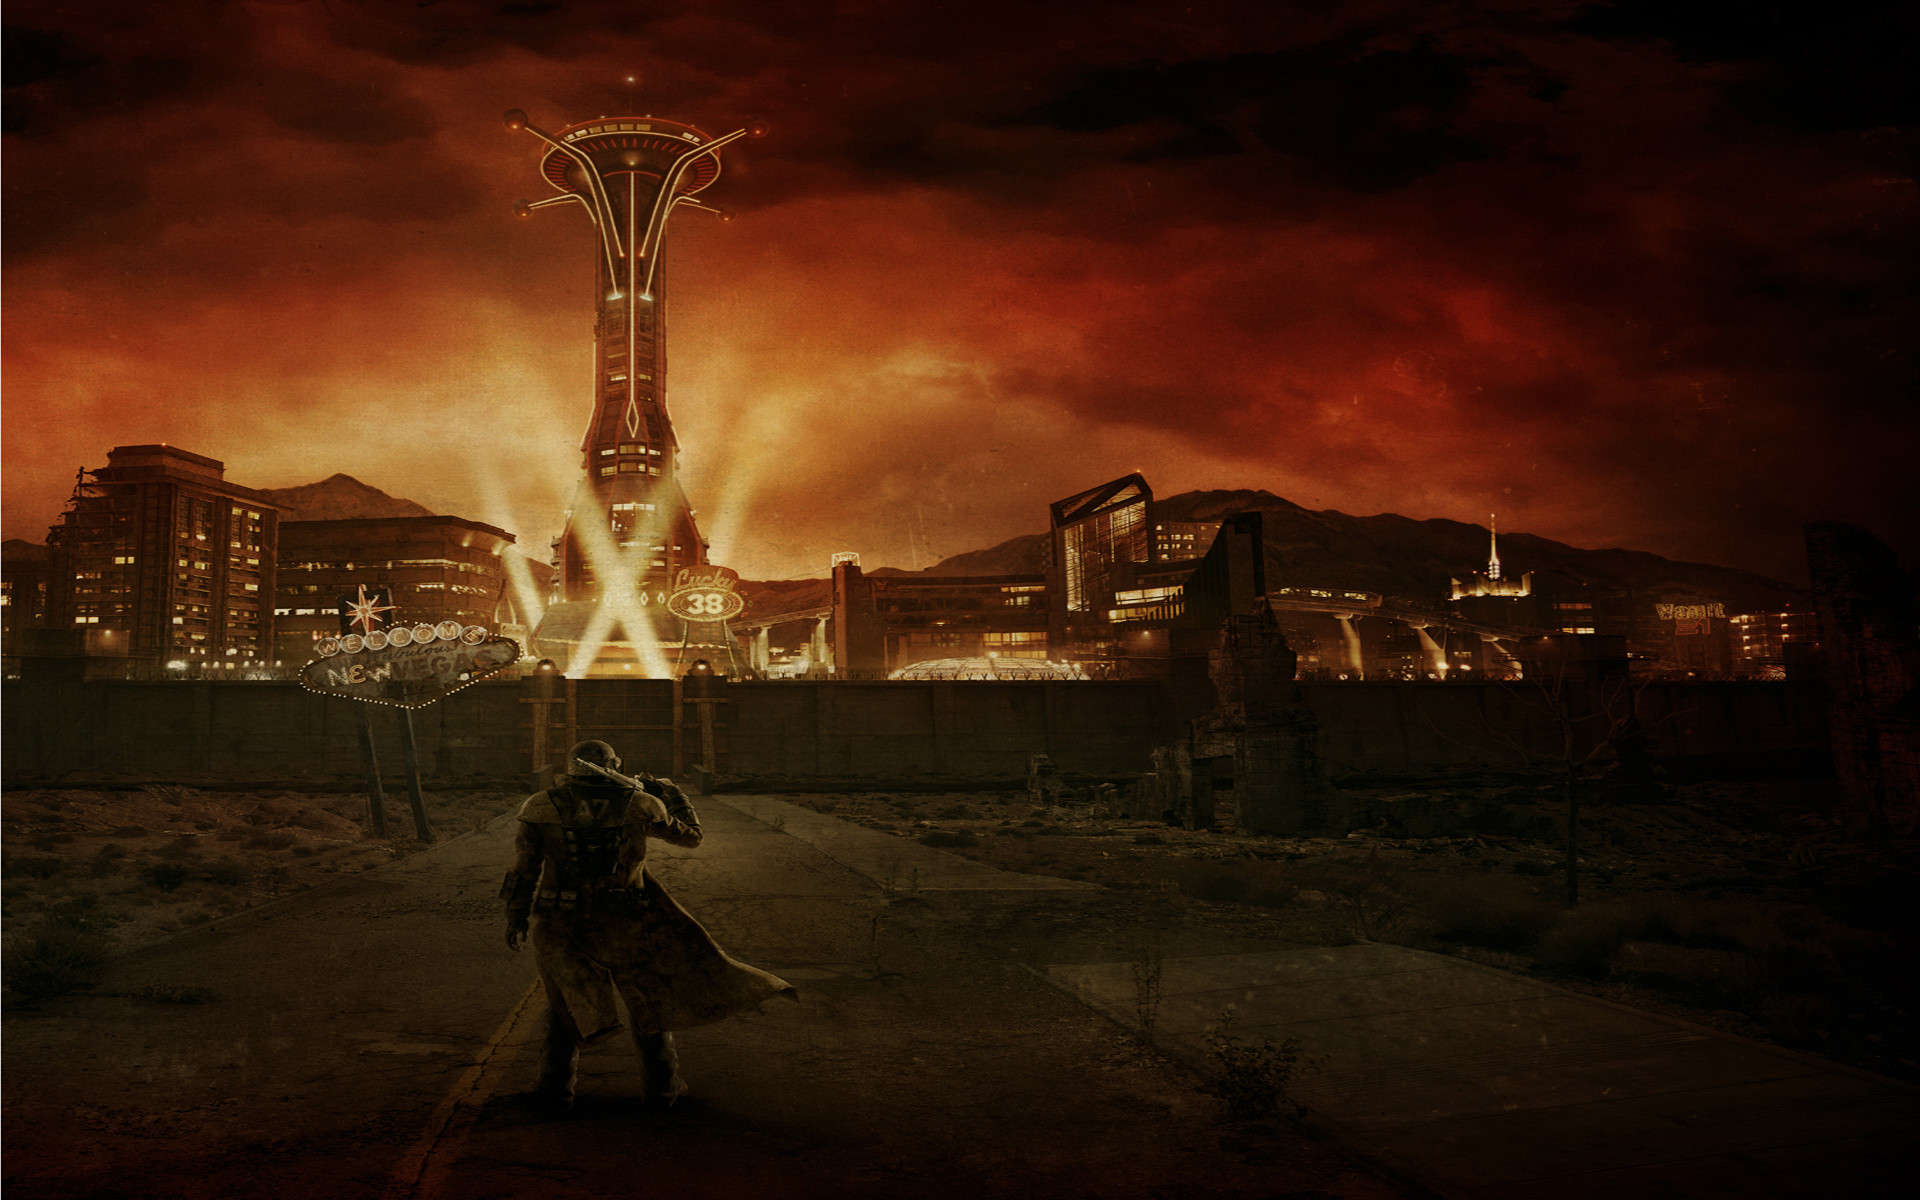 Fallout New Vegas Wallpaper 1080p (82+ images)